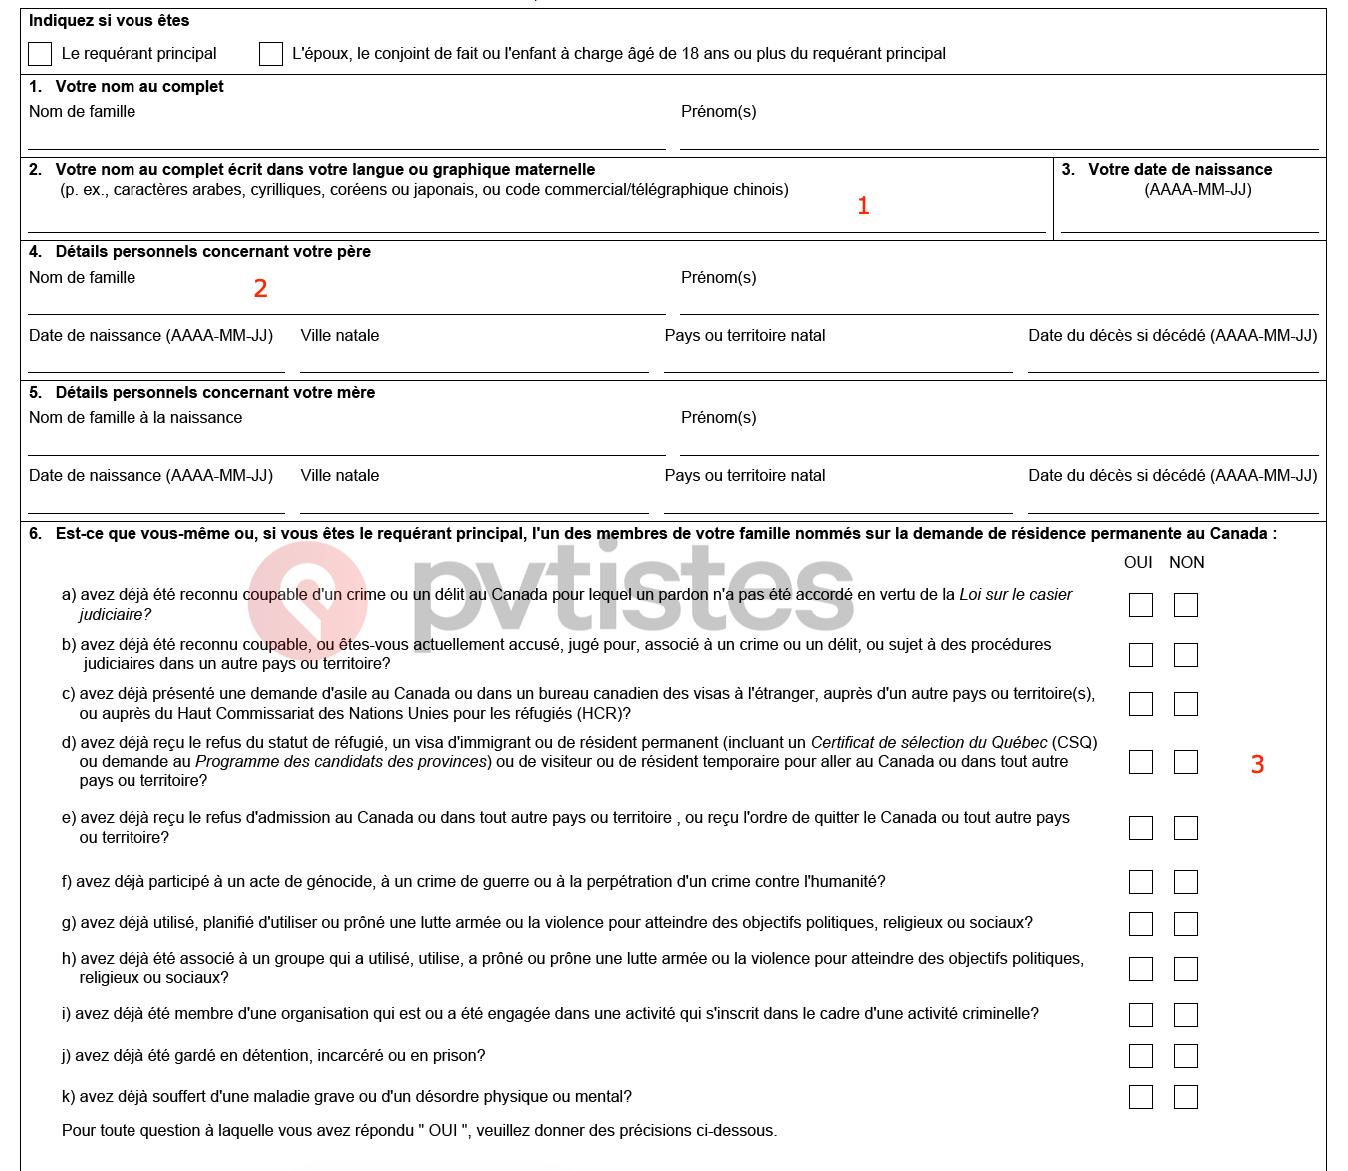 toriel Residence Permanente Canada - Federal 10